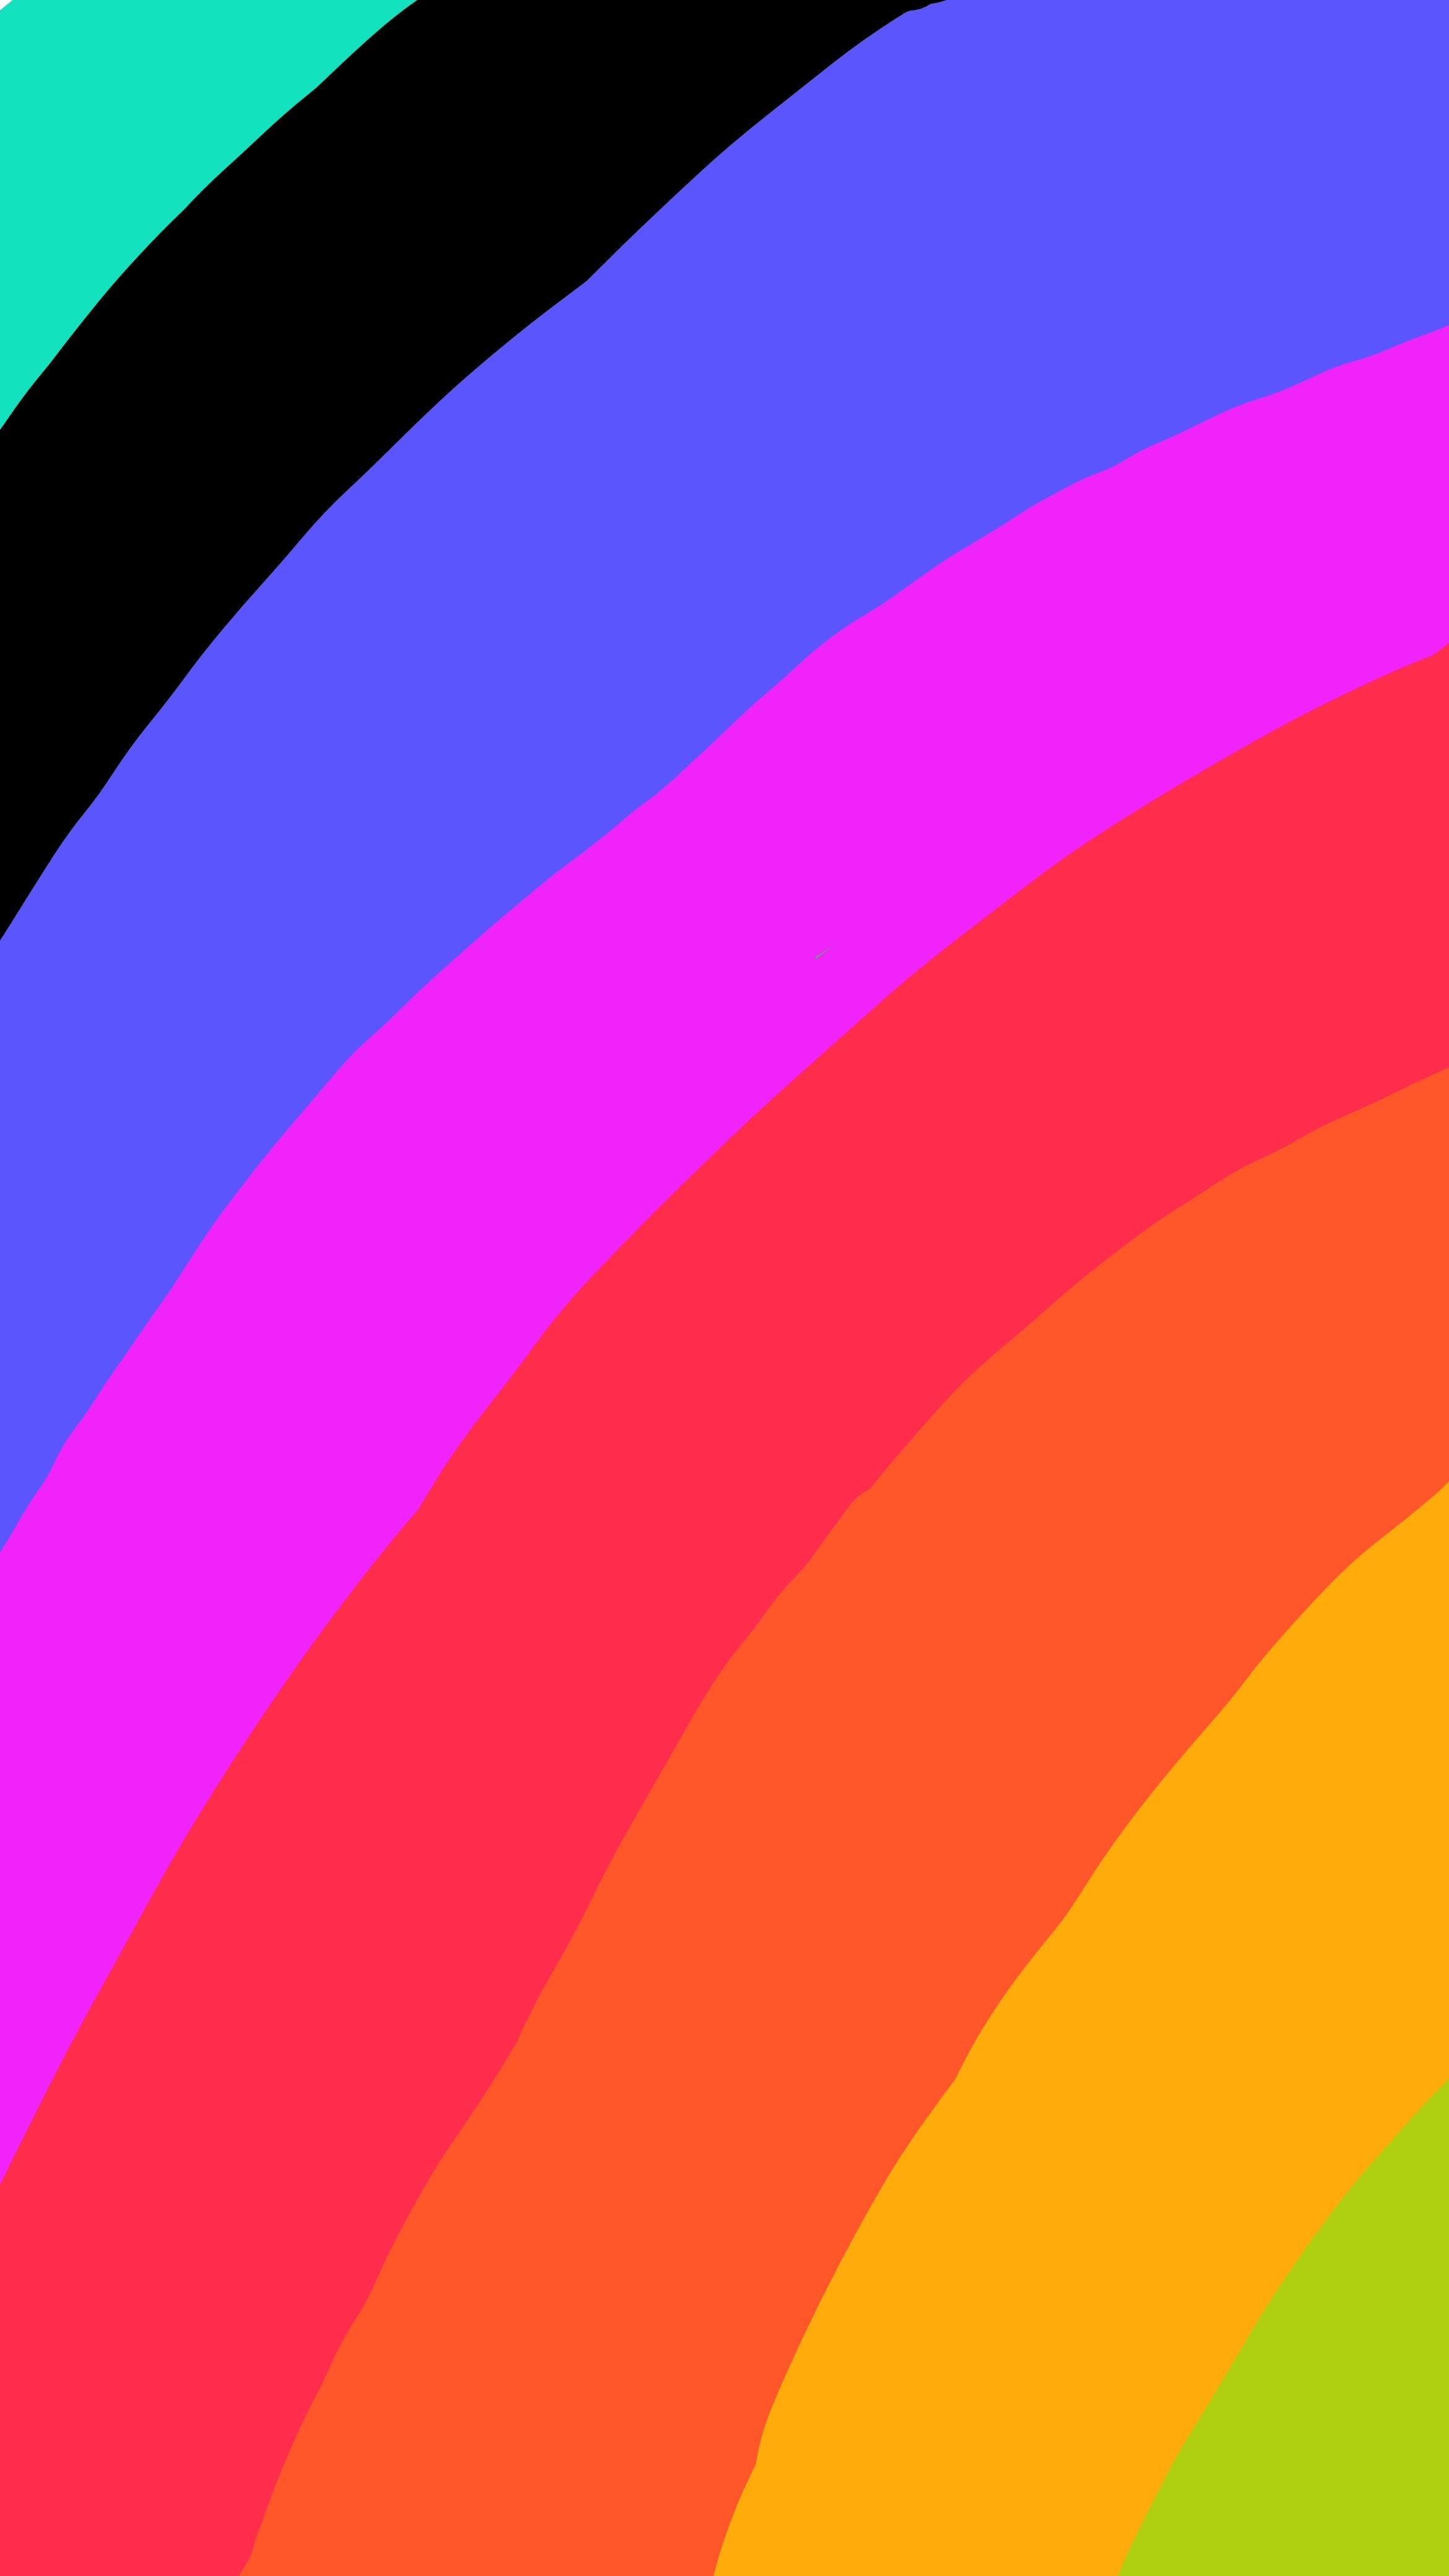 Unduh 1010 Wallpaper Xiaomi Gambar Gratis